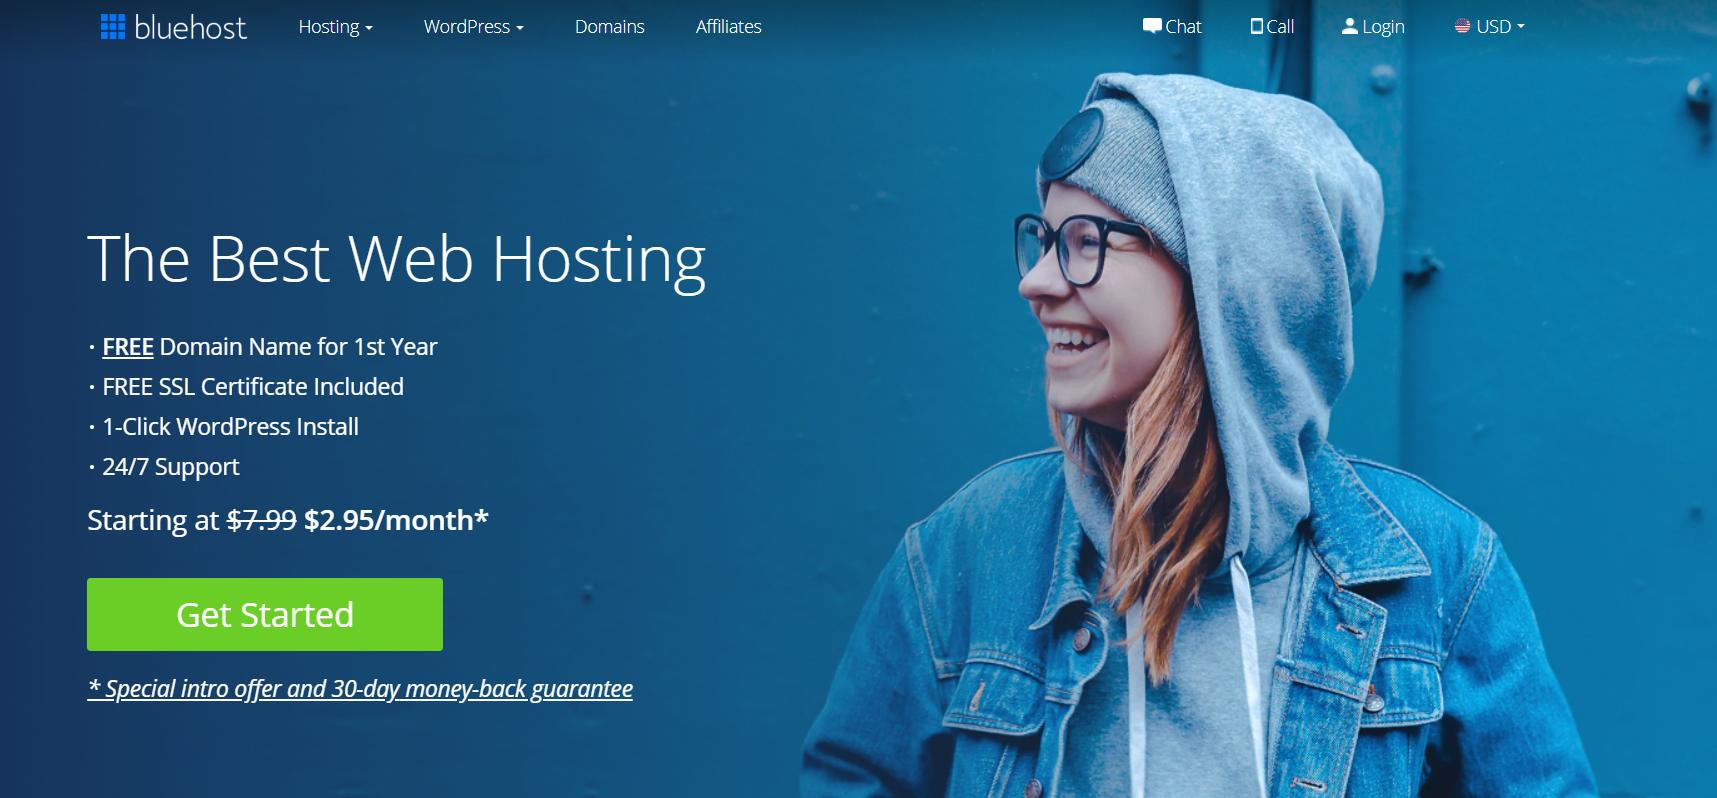 WordPress and Bluehost make a great Wix alternative